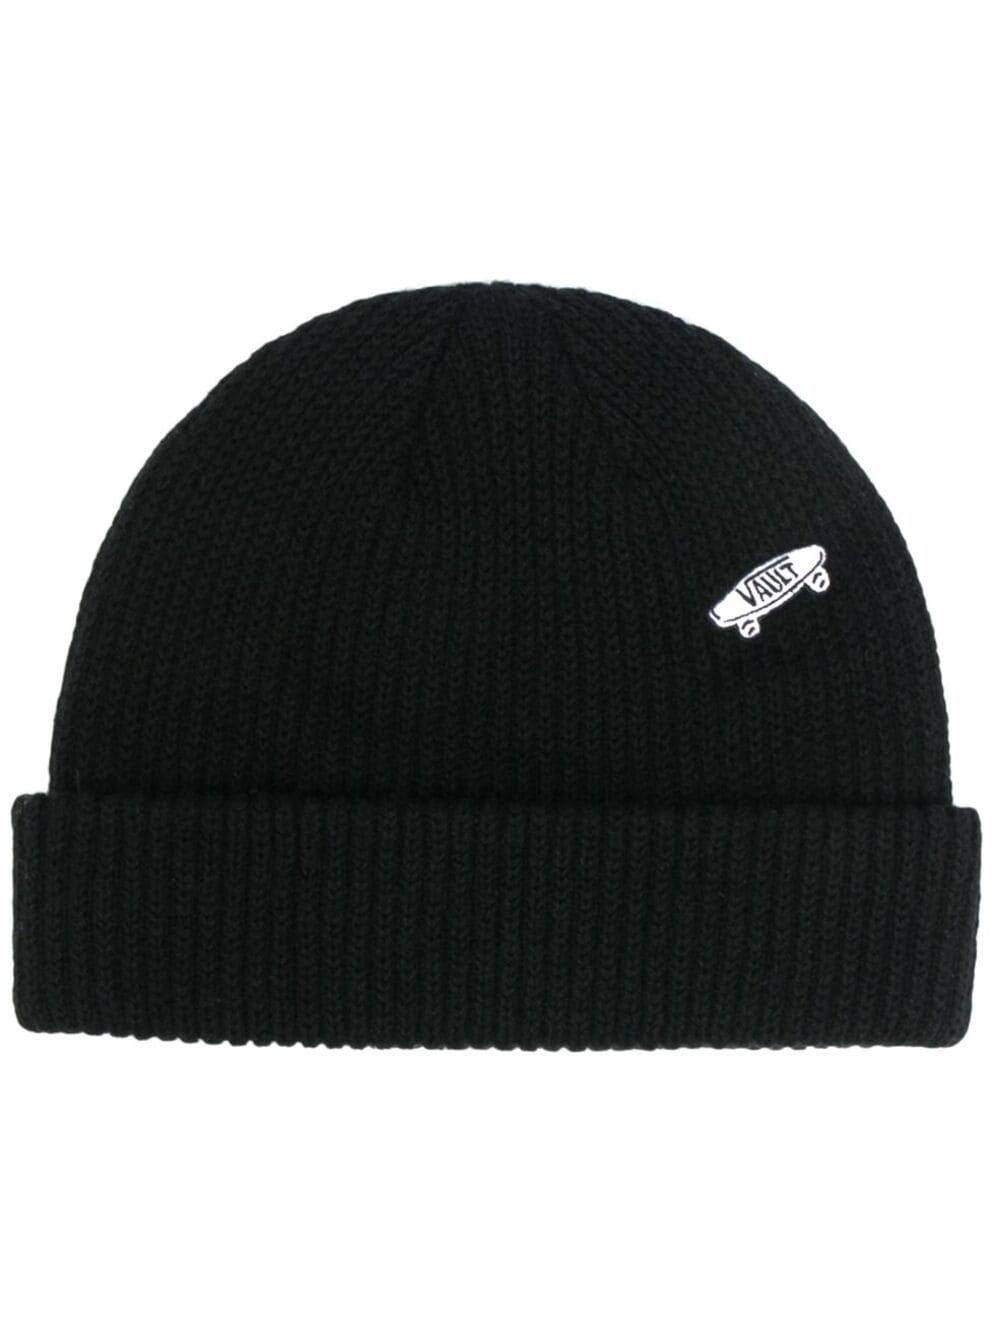 Cappello in lana nero uomo VANS VAULT   Cappelli   VN0A4VKTBLK1